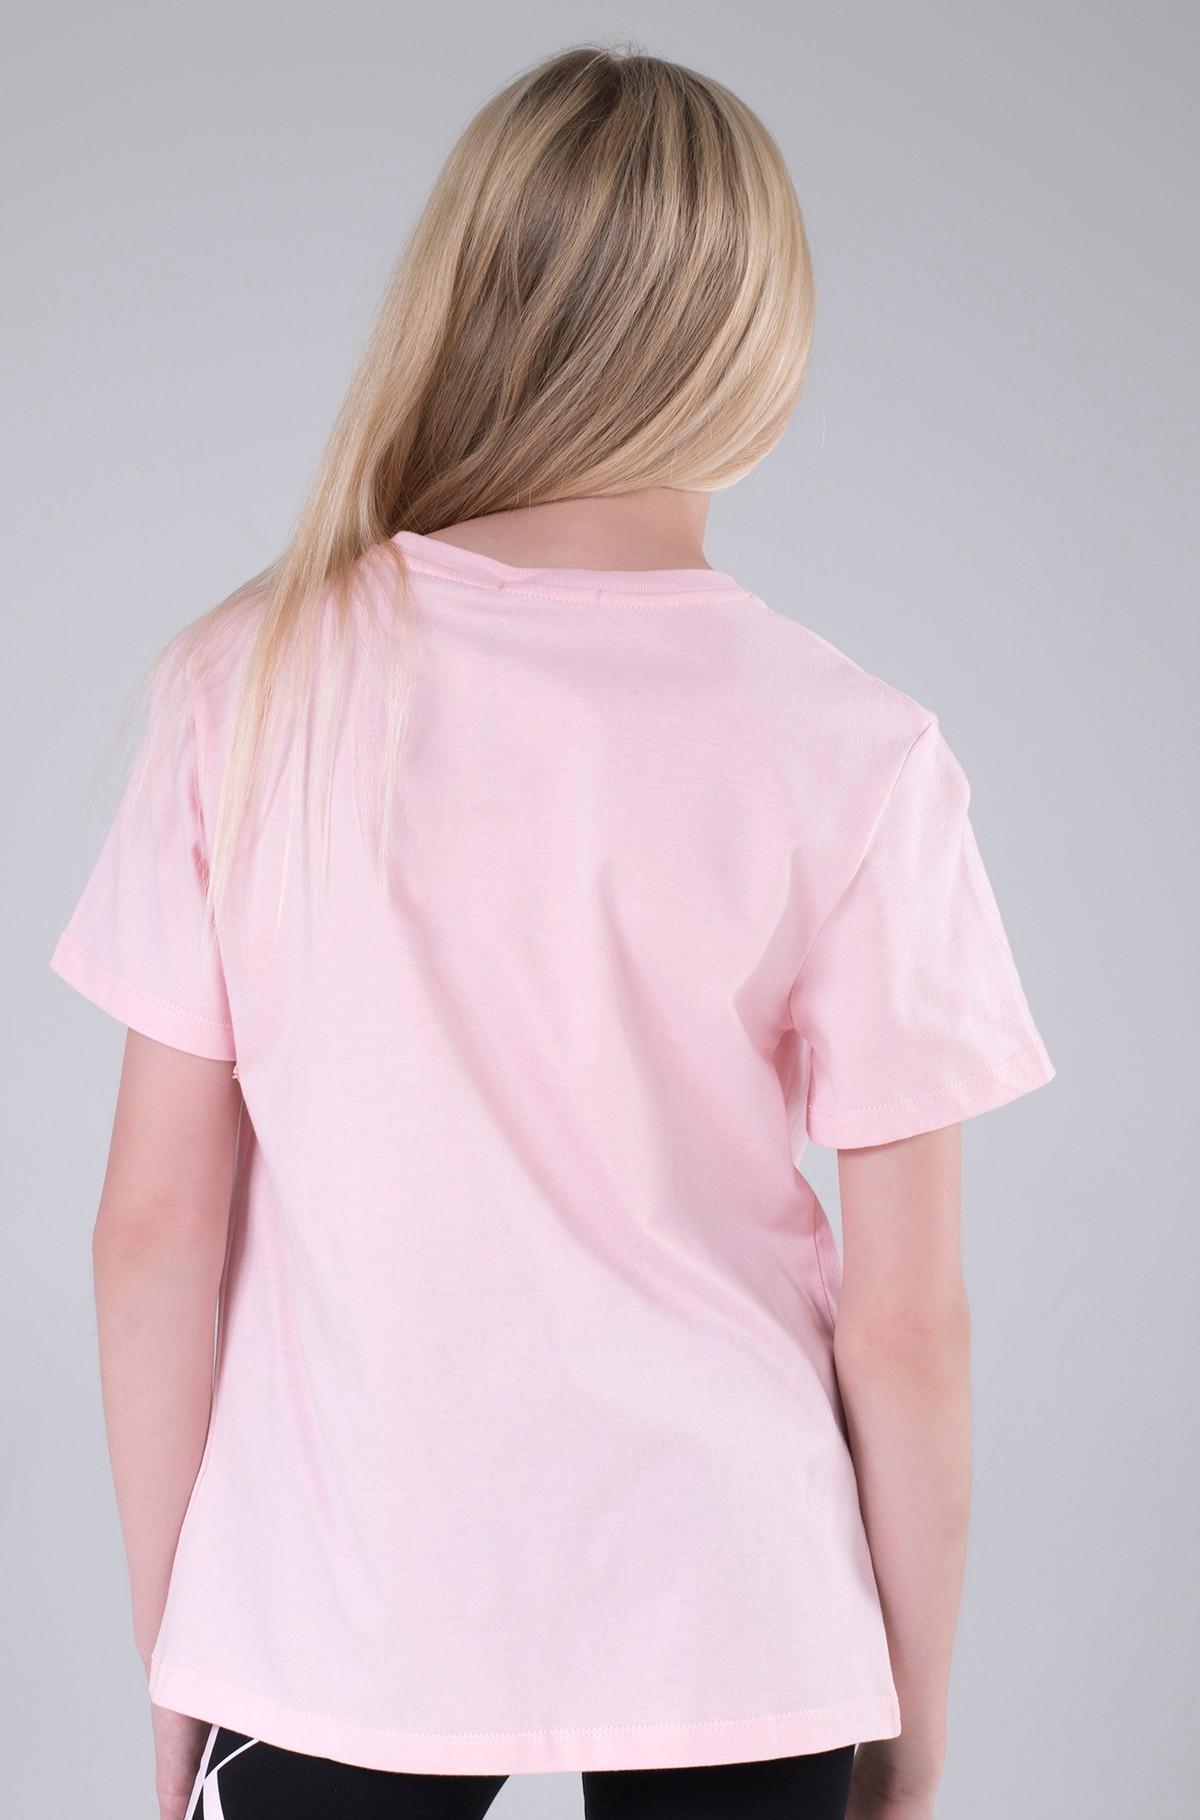 Bērnu T-krekls MONOGRAM LOGO T-SHIRT-full-2